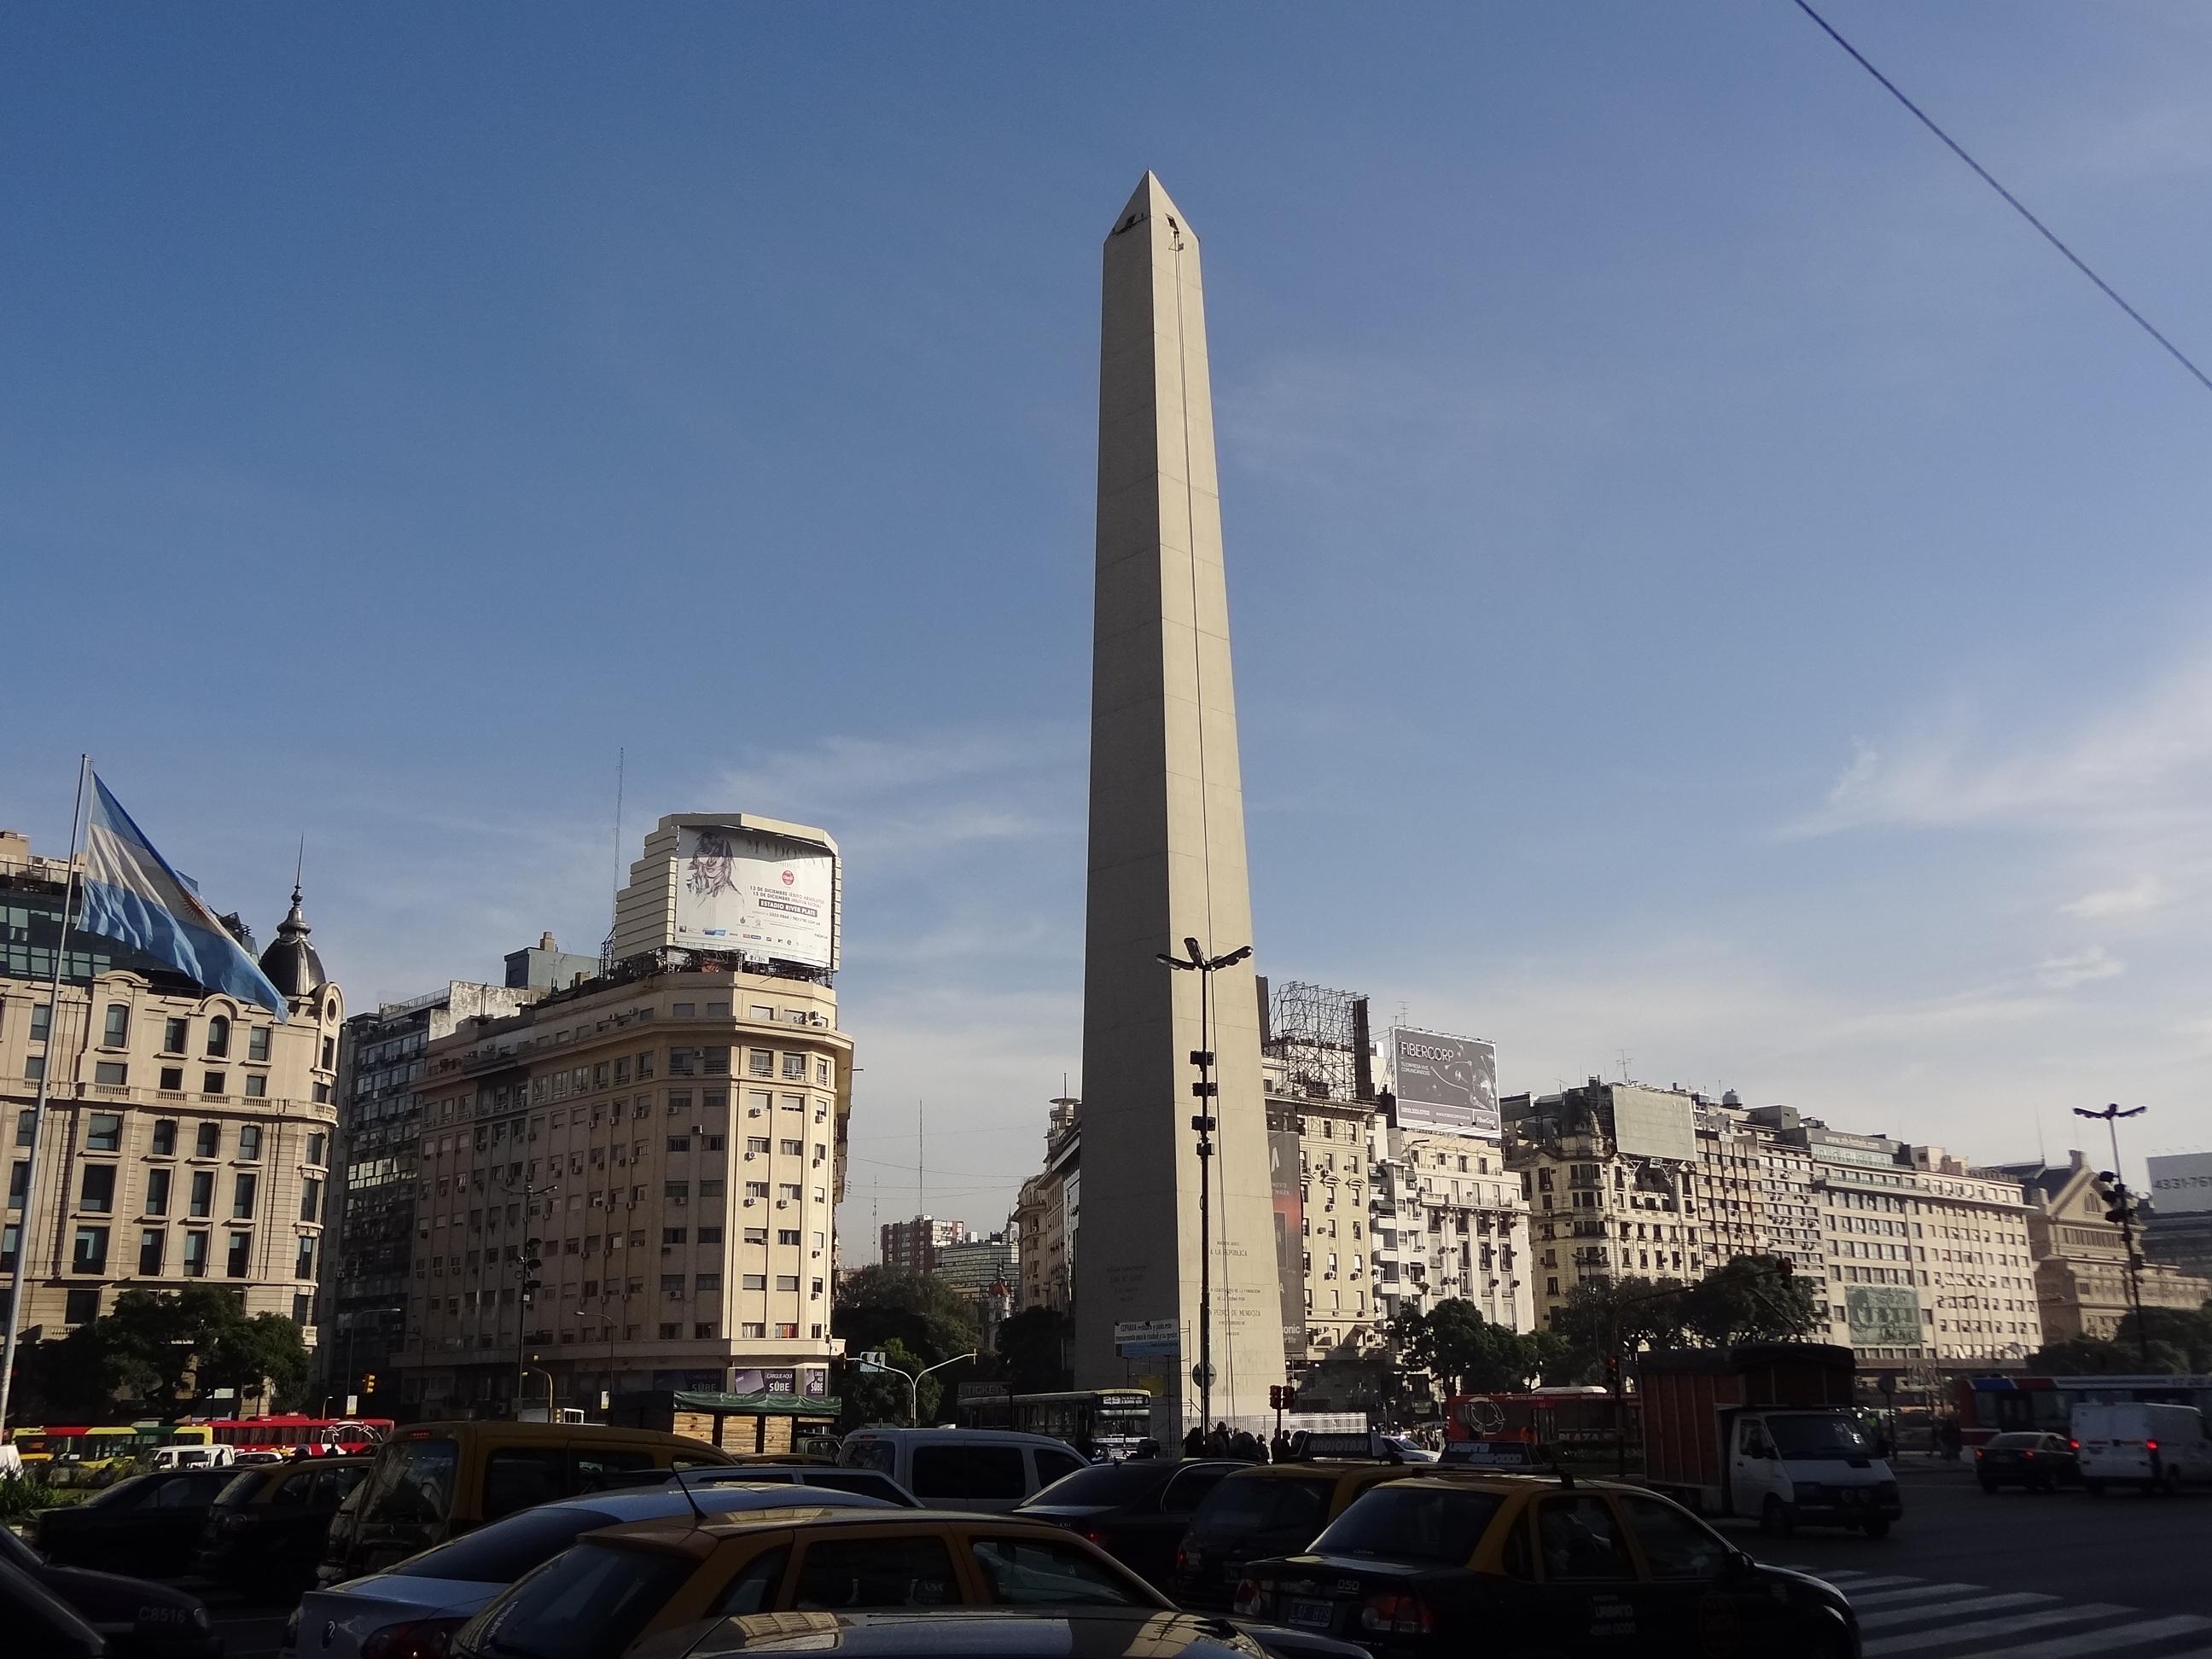 Obelisco-Buenos-Aires-Argentina-Roteiro-Turismo Buenos Aires Roteiro para 1 semana